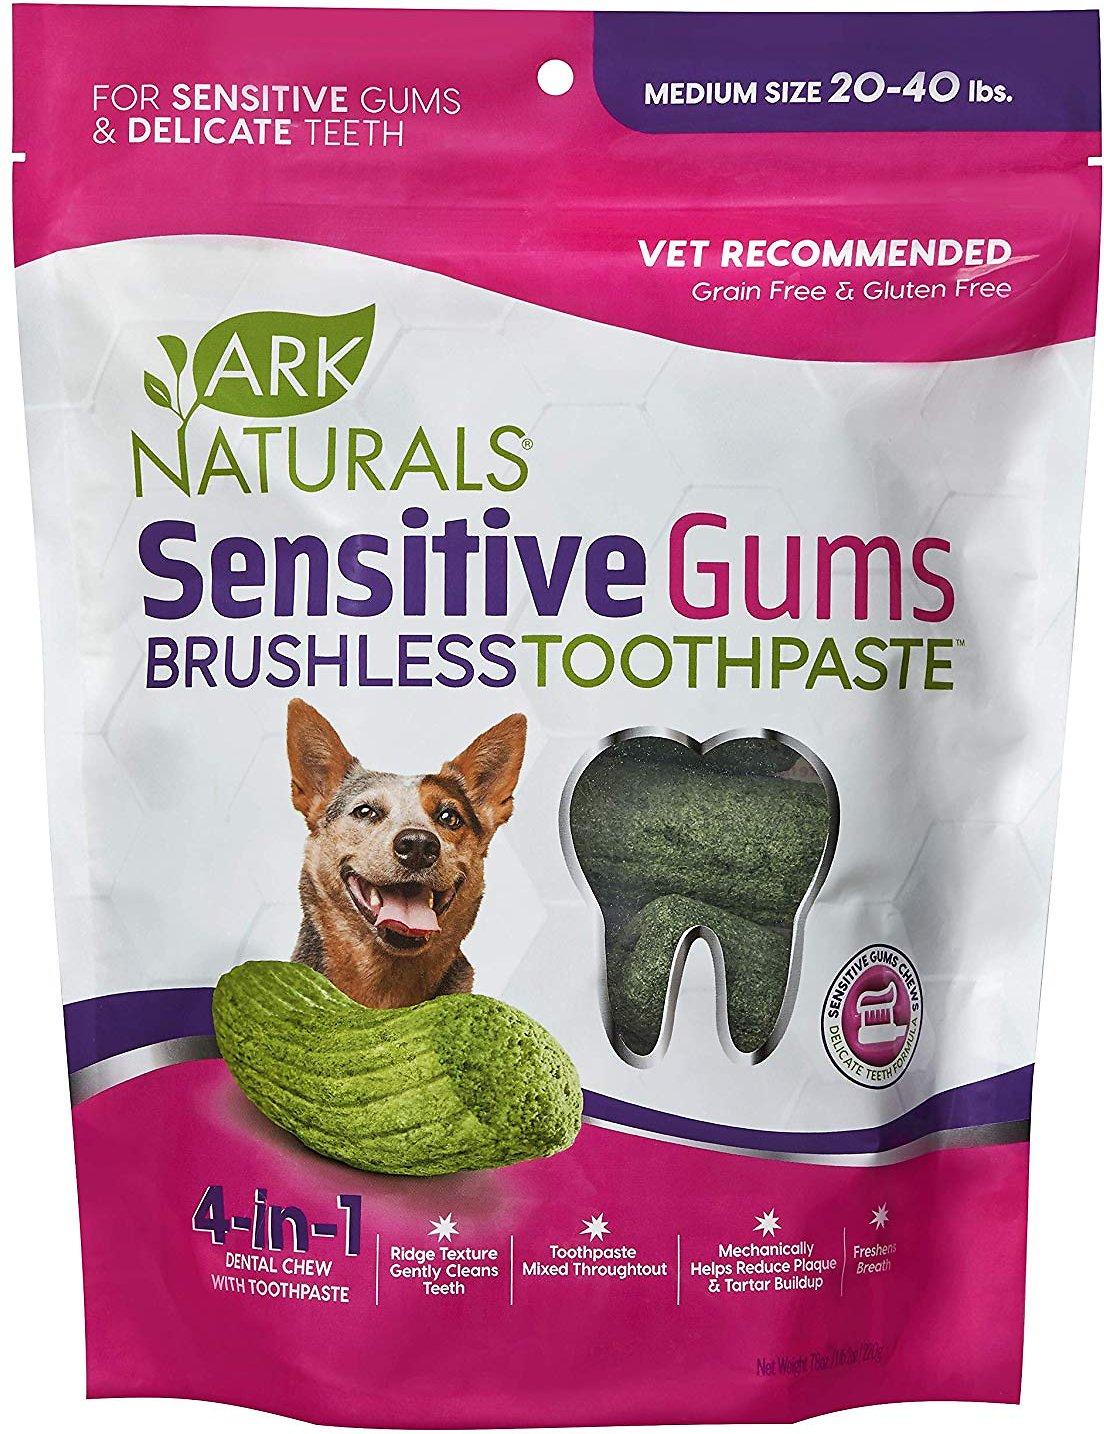 Ark Naturals Sensitive Gums Brushless Toothpaste 4-in-1 Dog Dental Chews, 7.8-oz